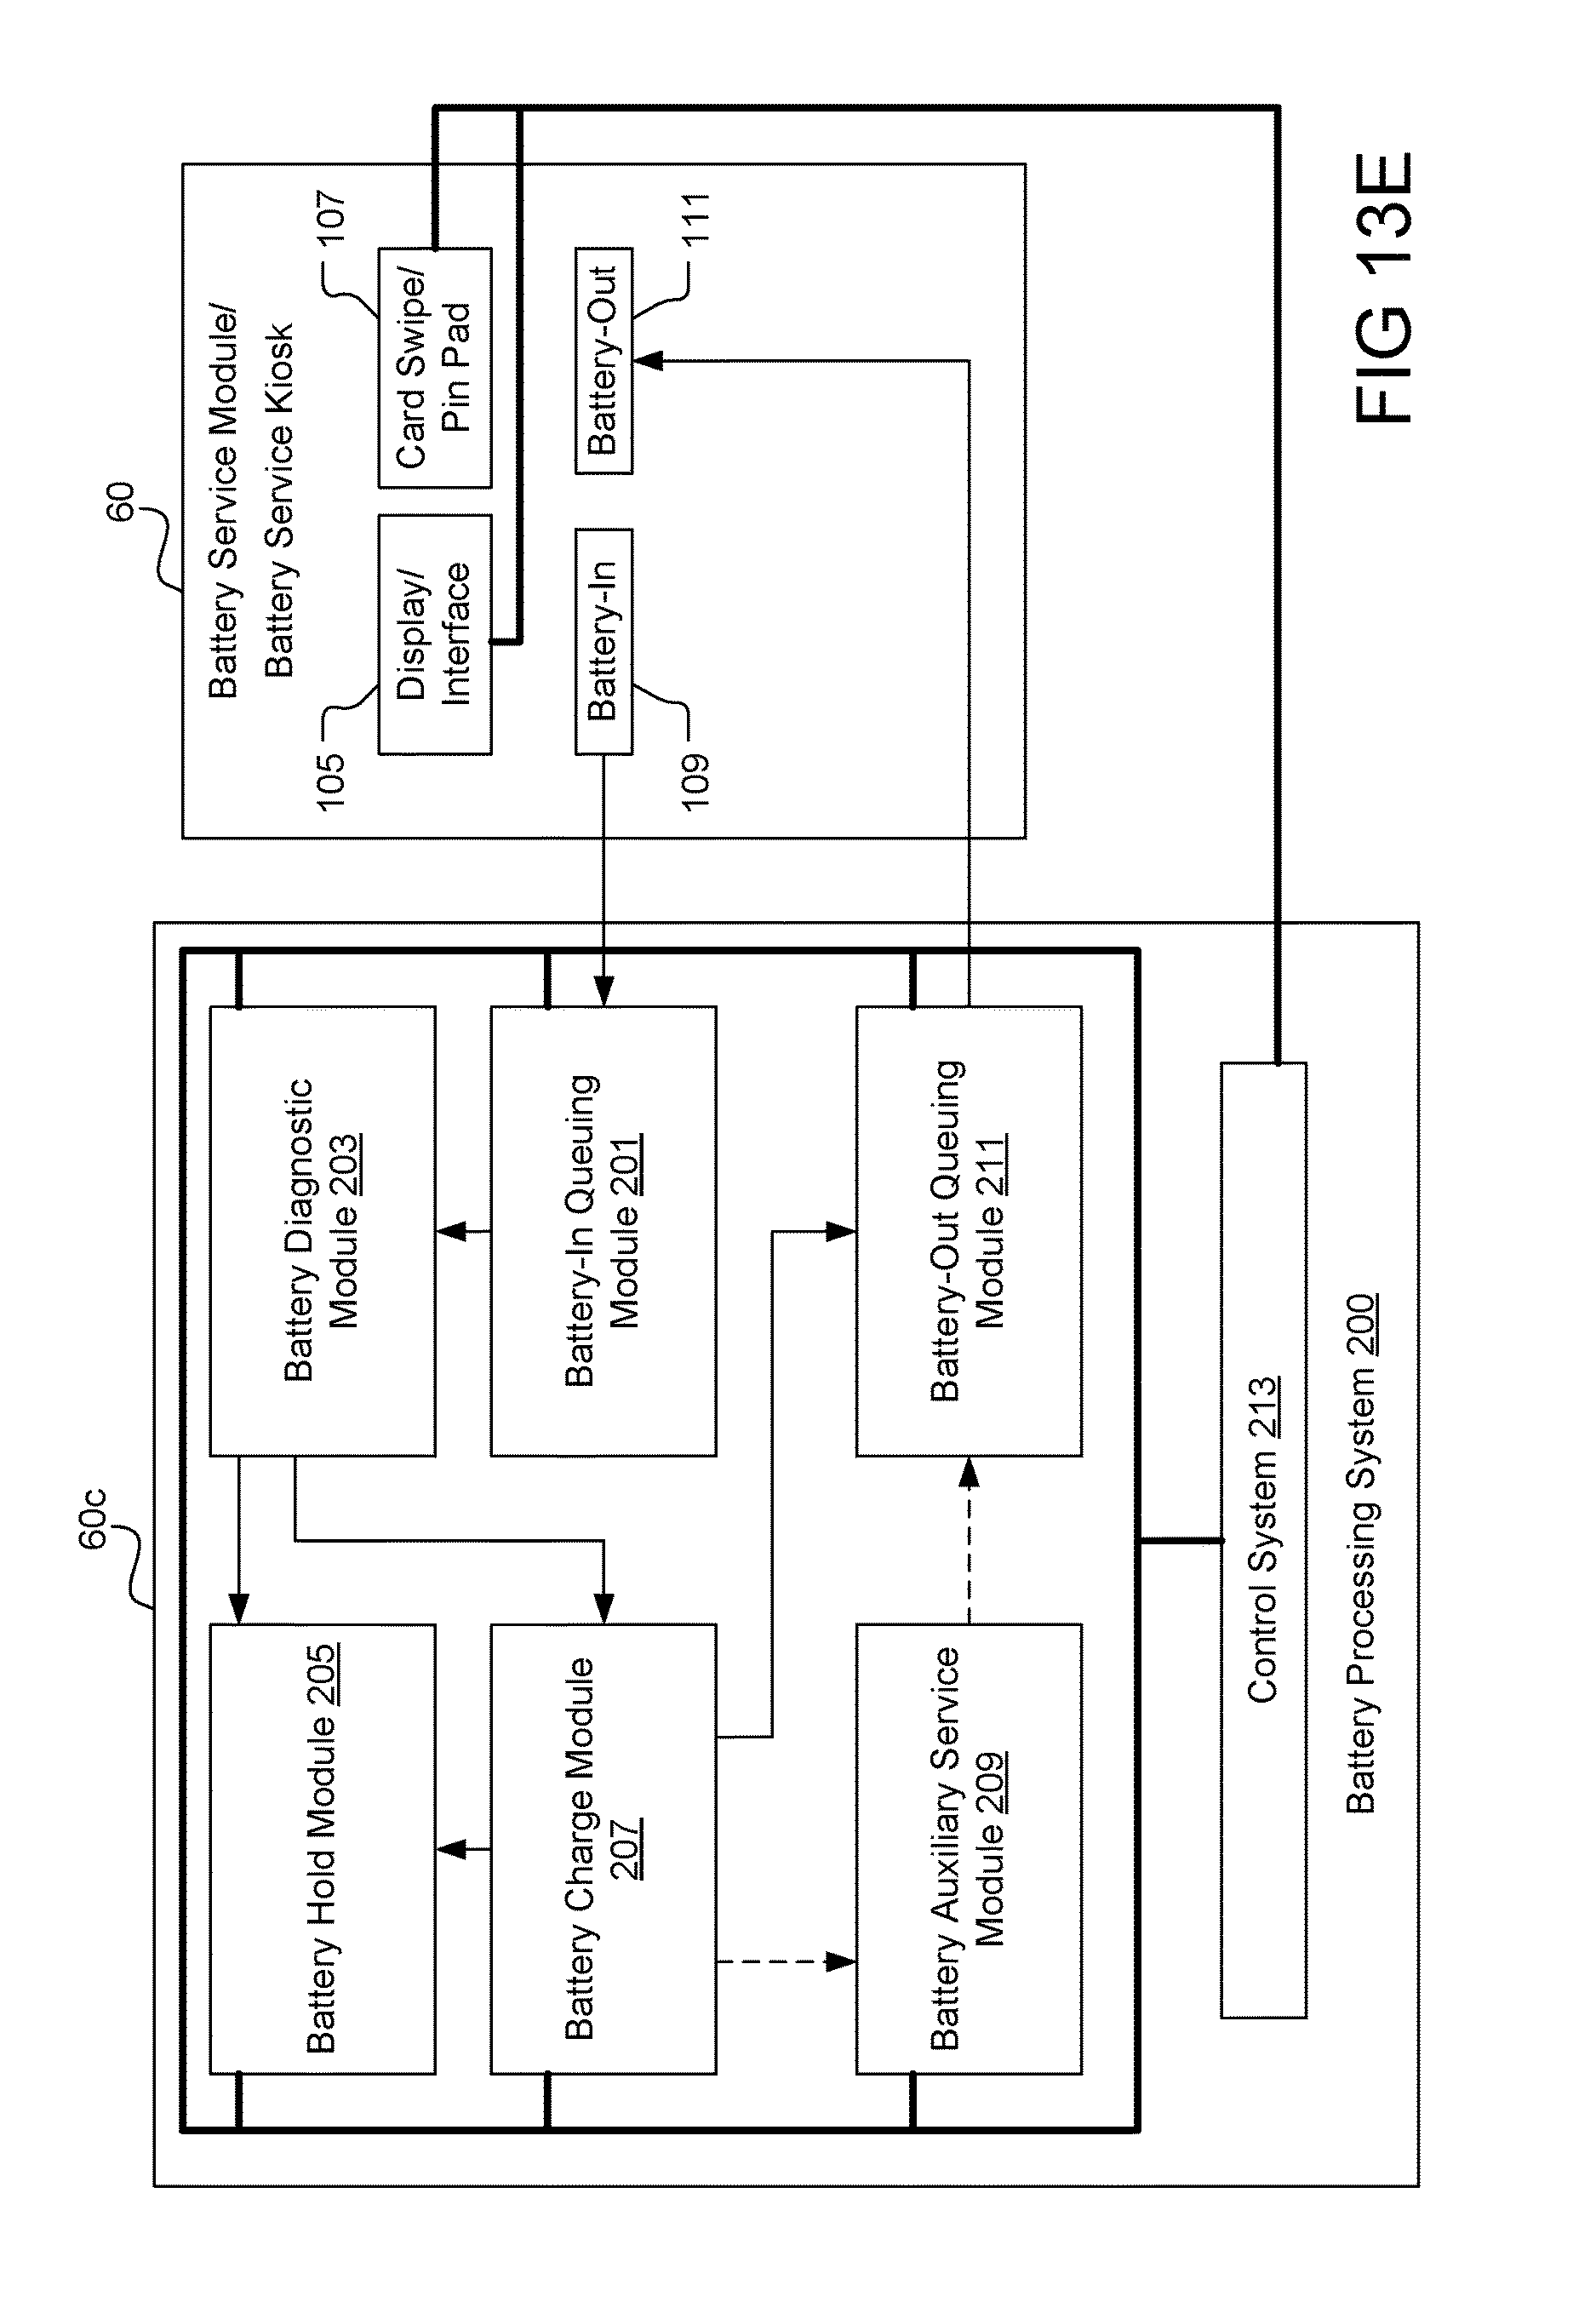 index 57 led and light circuit circuit diagram seekiccom wiring